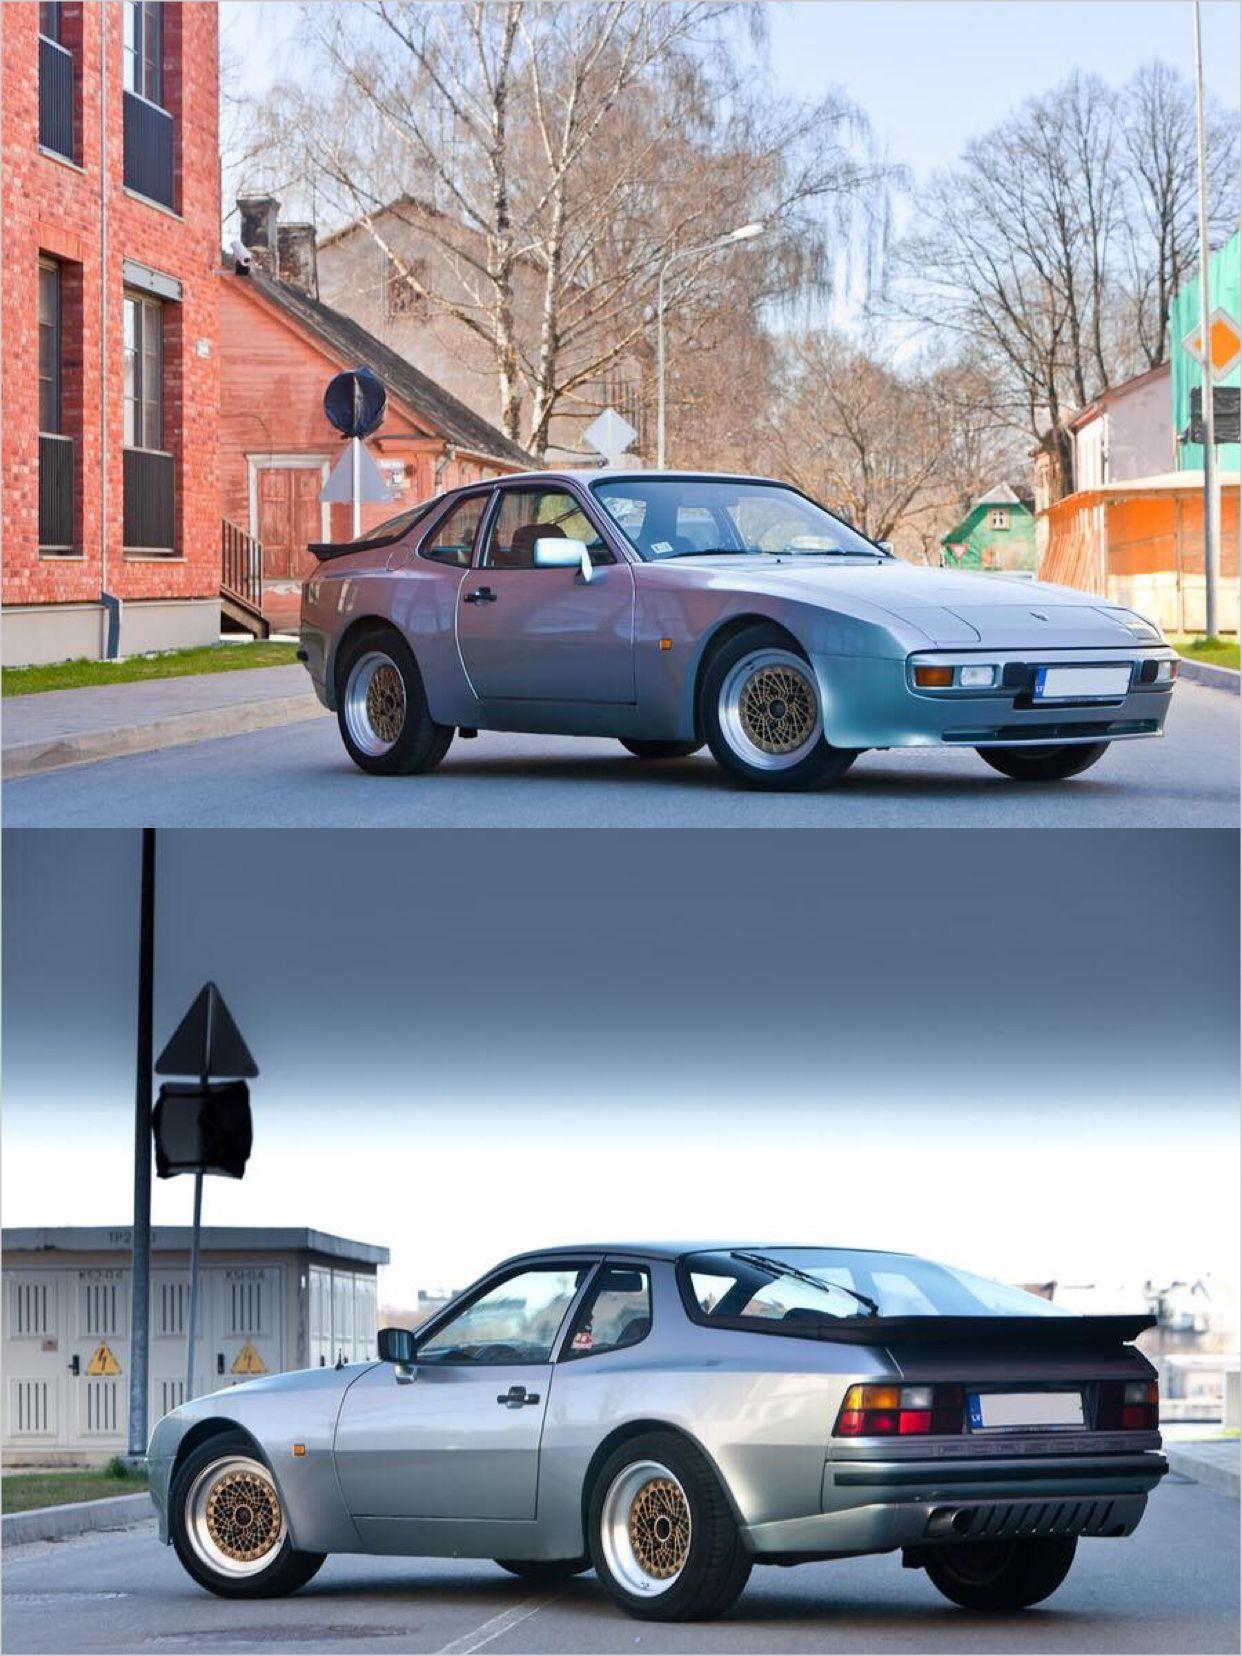 Porsche 944 Euro Spec With Euro Rear Valance And Bbs Wheels Porsche 944 Porsche Porsche 924